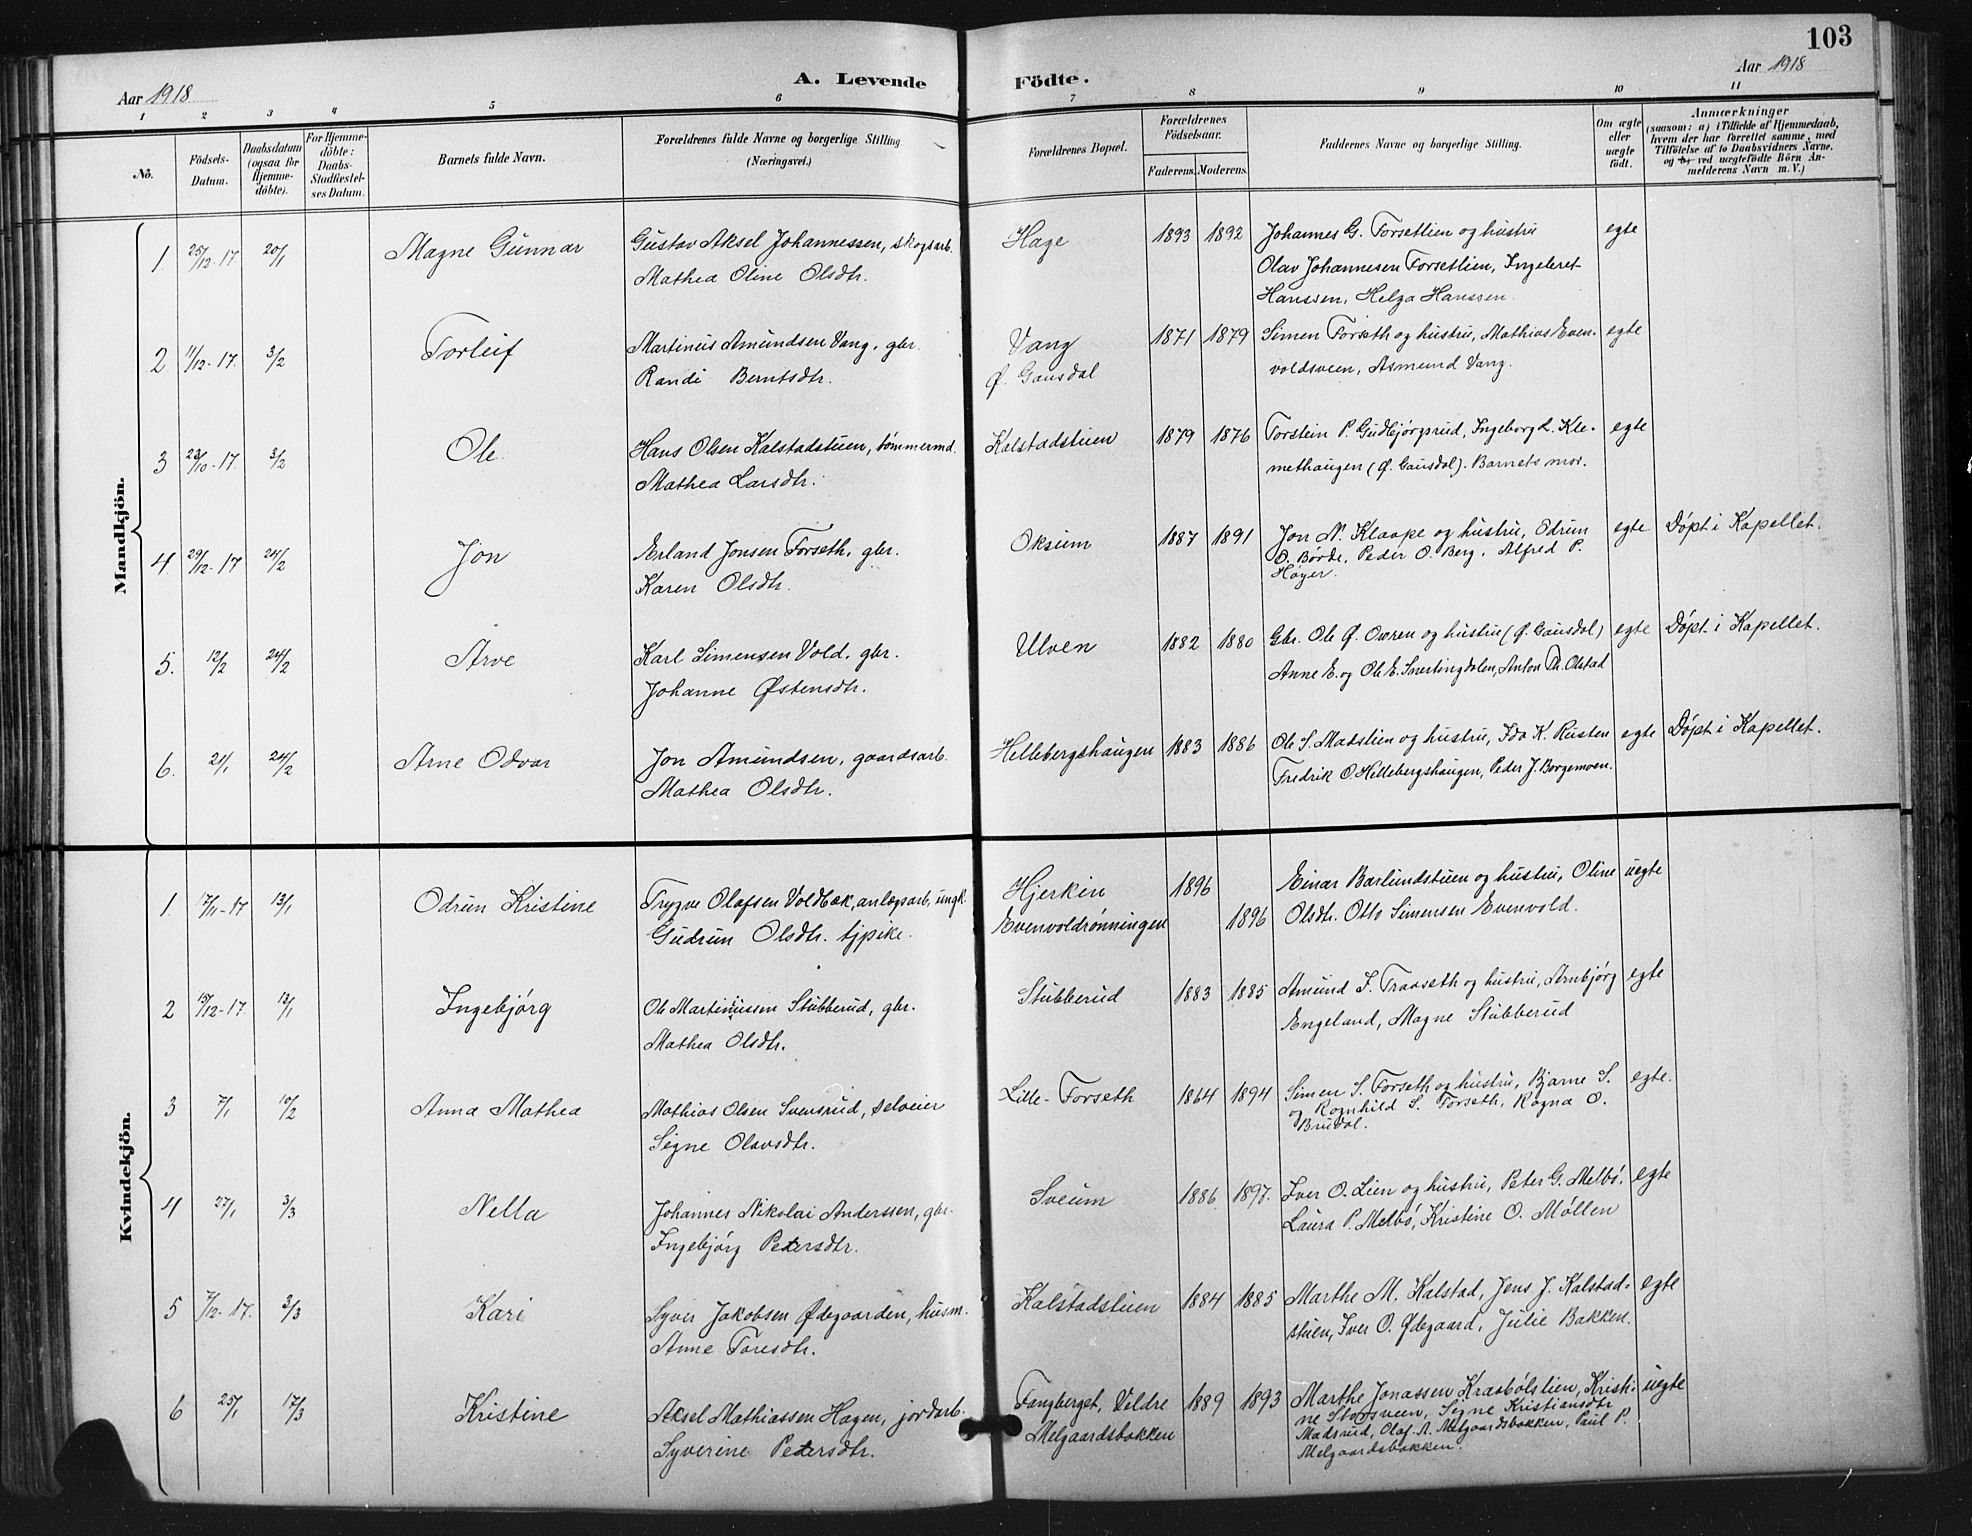 SAH, Vestre Gausdal prestekontor, Klokkerbok nr. 3, 1896-1925, s. 103